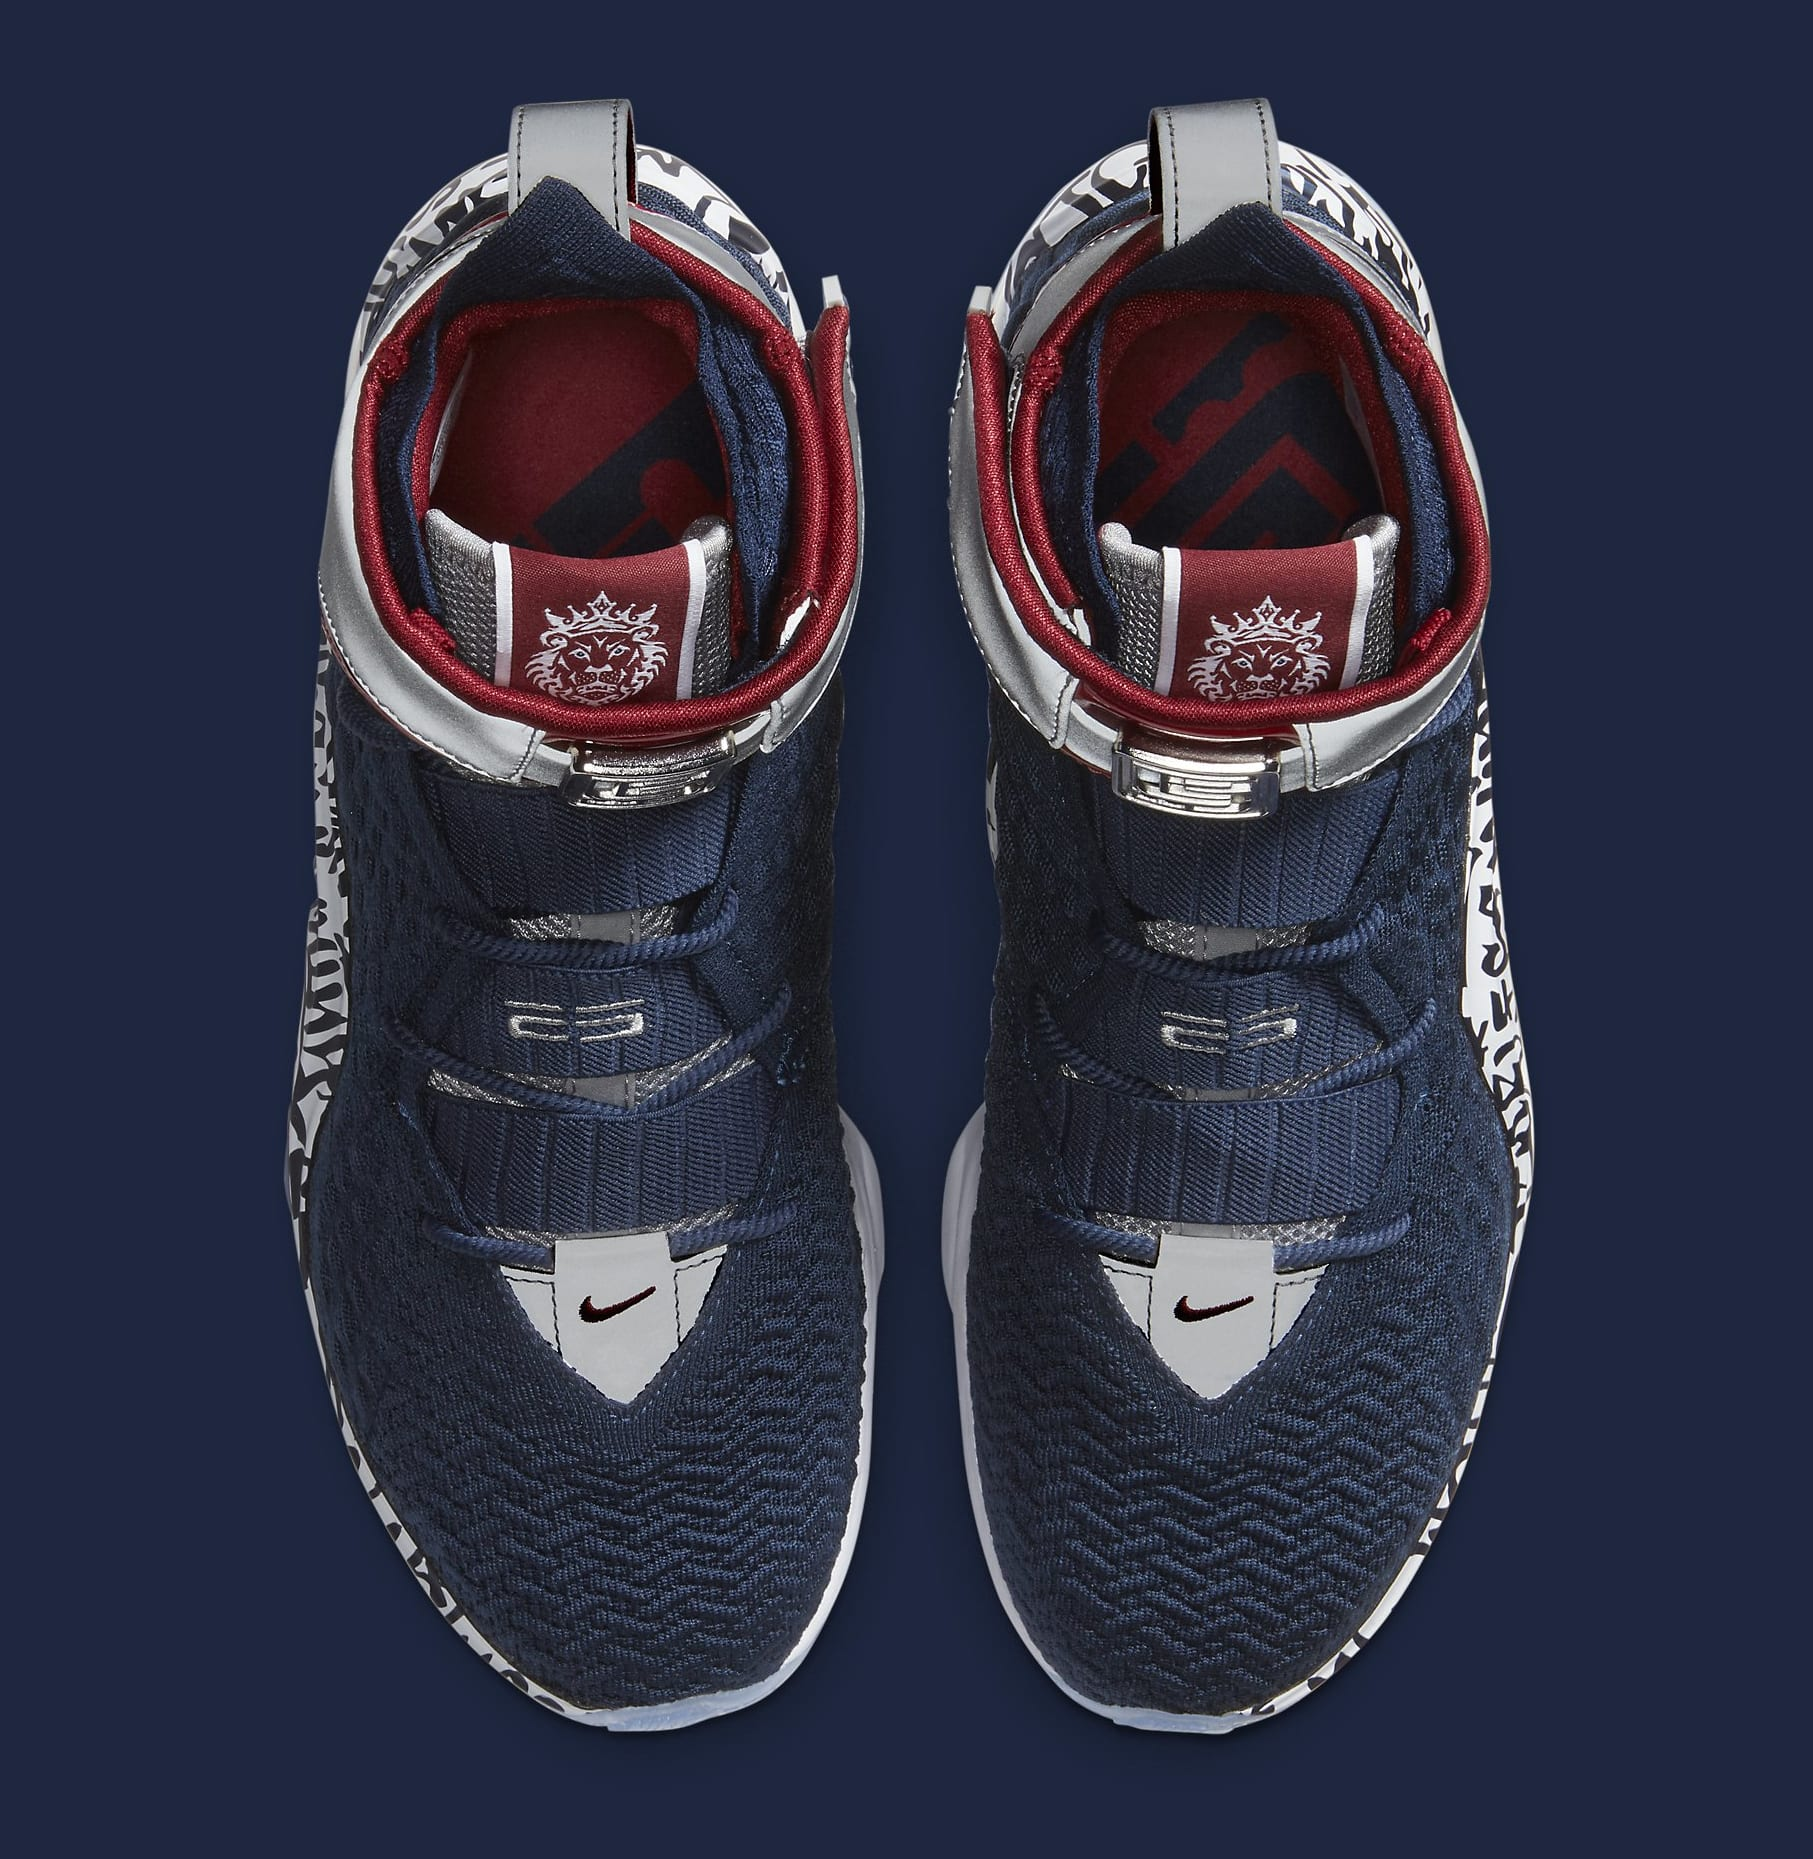 Nike LeBron 17 'All-Star Graffiti' CT6047-400 Top